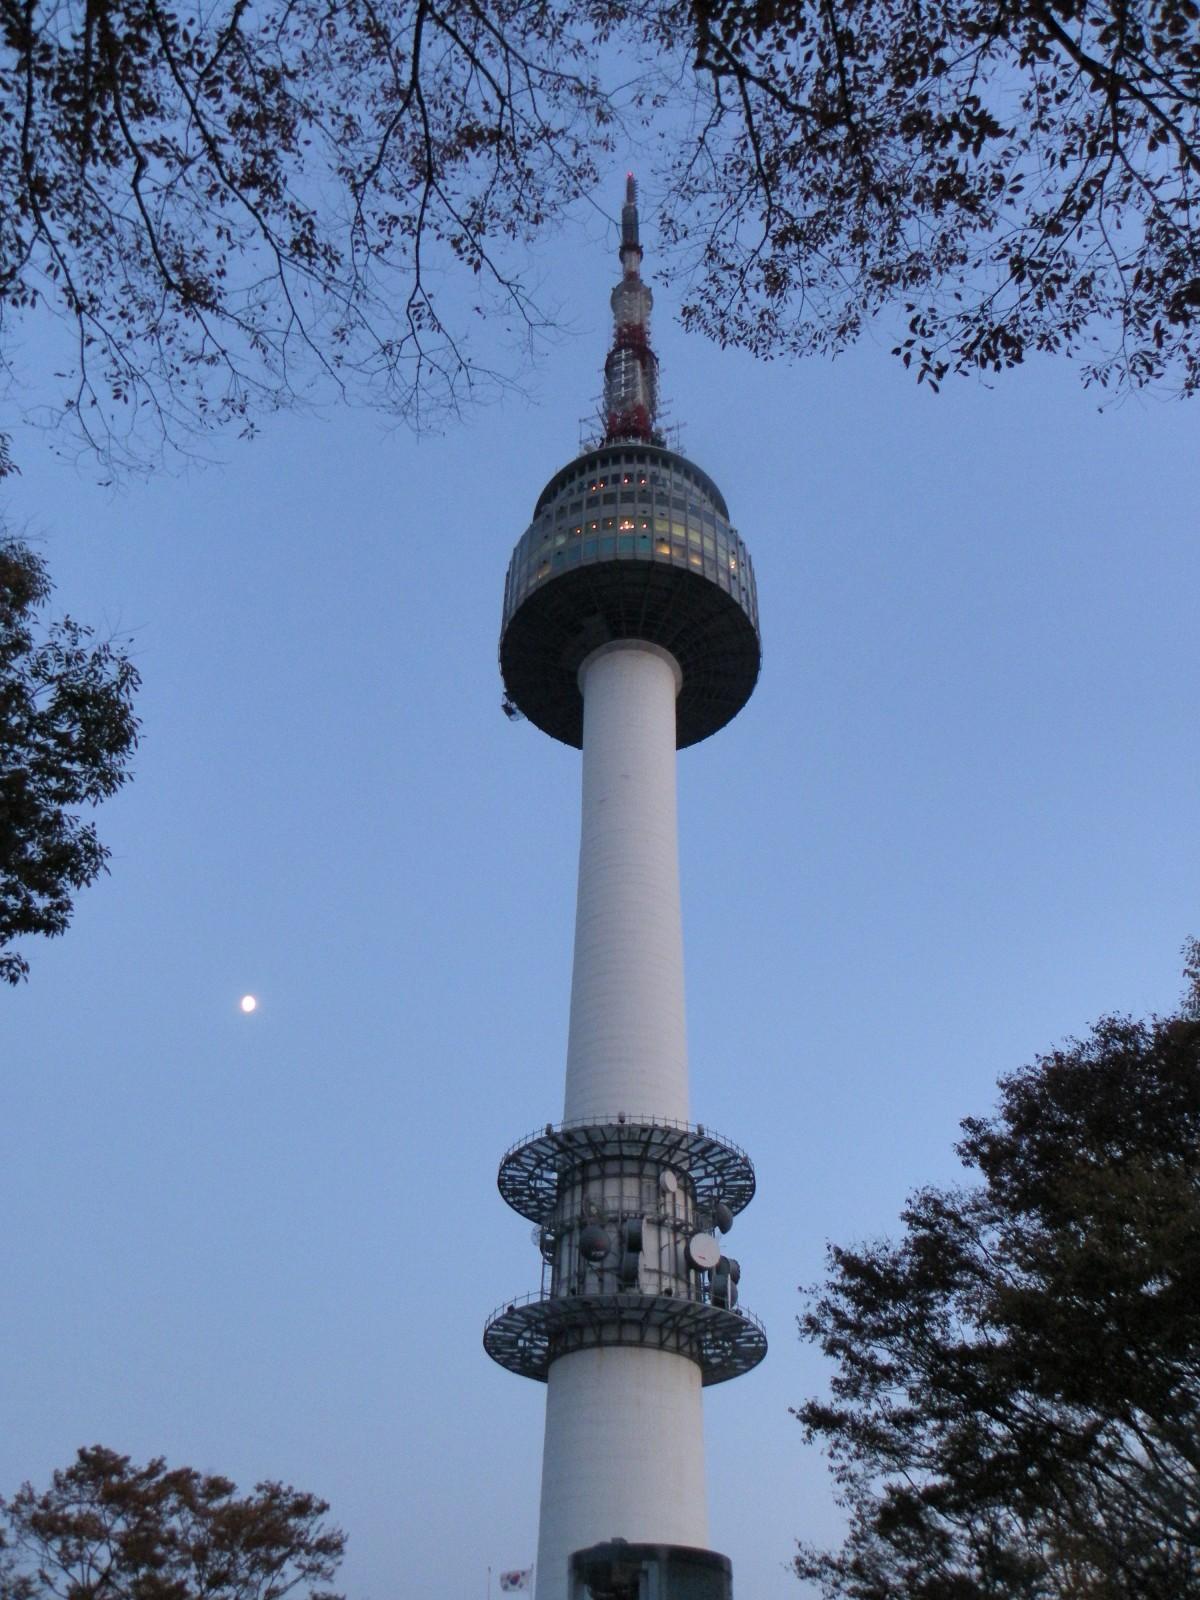 Free Images Landmark Water Tower Steeple Seoul